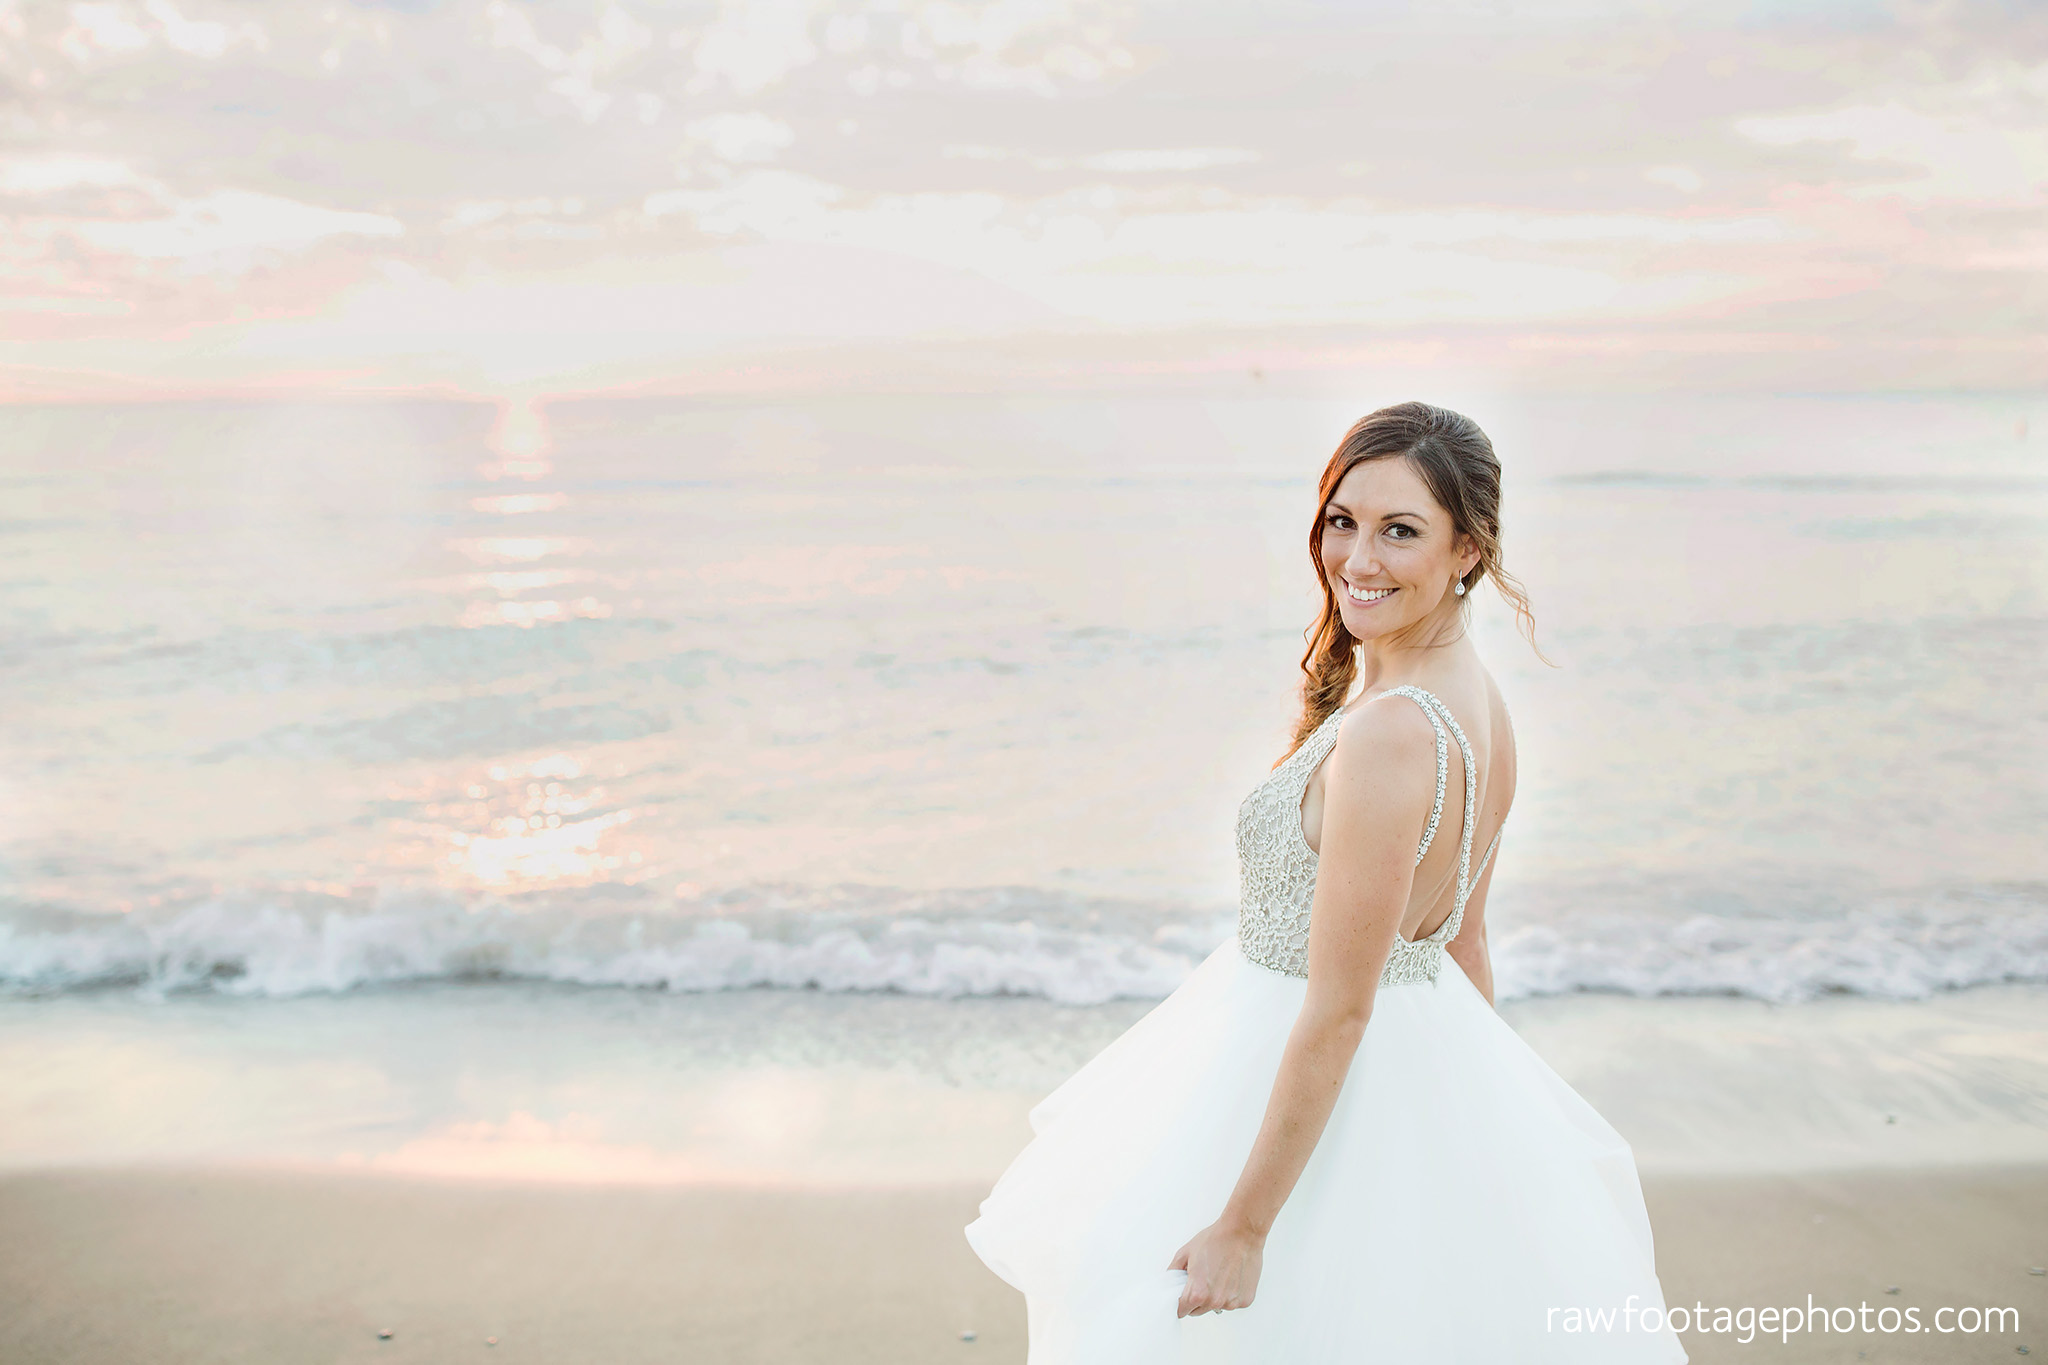 london_ontario_wedding_photographer-grand_bend_wedding_photographer-oakwood_resort_wedding-beach_wedding-sunset_wedding-raw_footage_photography072.jpg